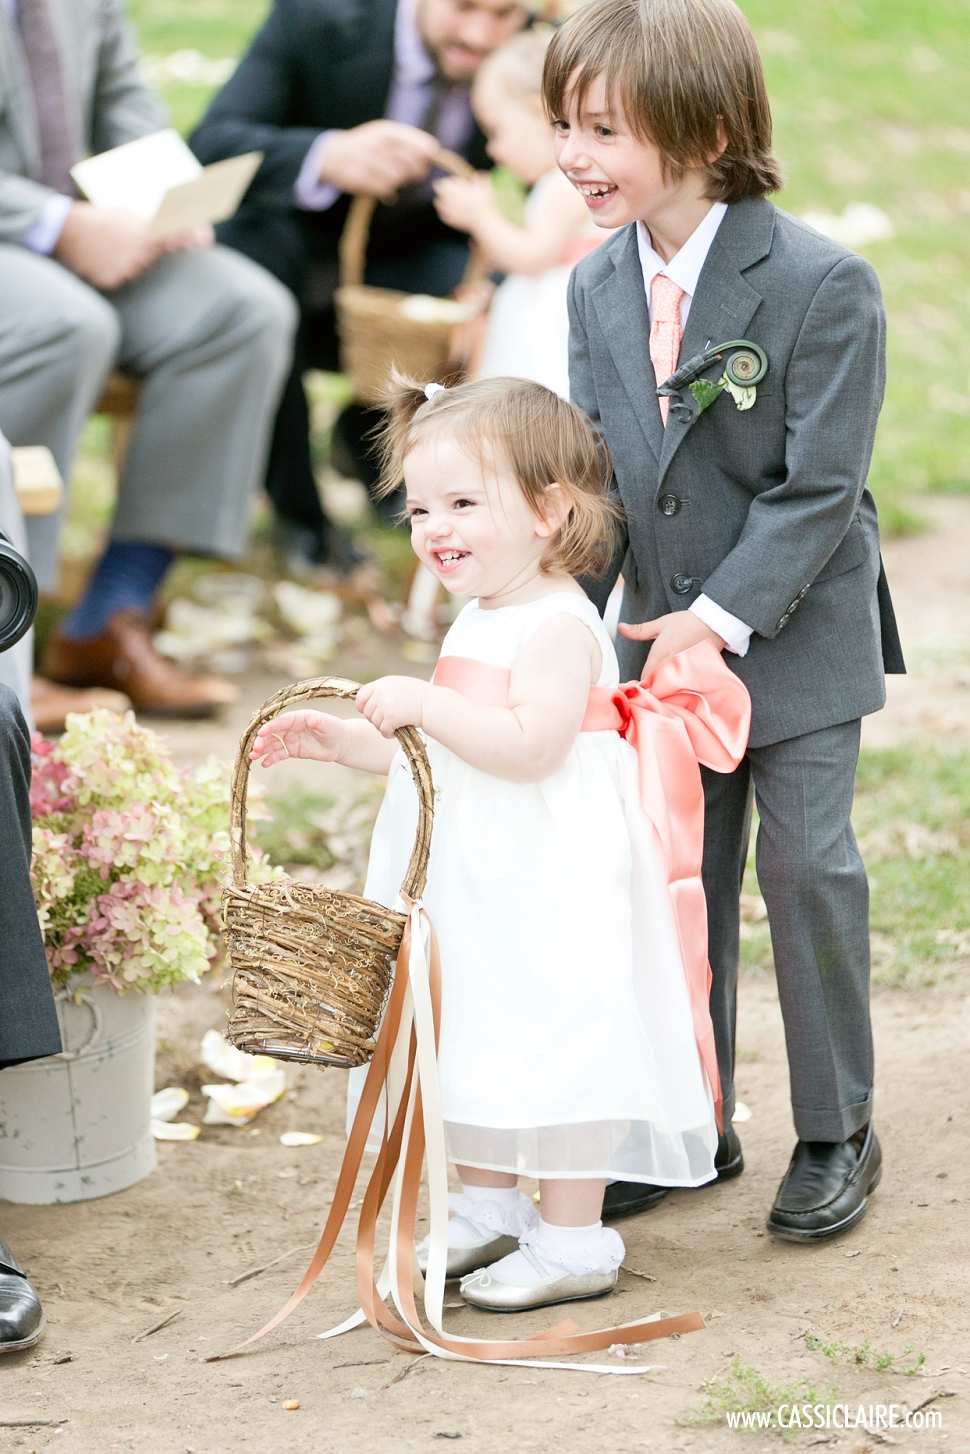 Prospect-Park-Picnic-House-Wedding_Cassi-Claire_31.jpg